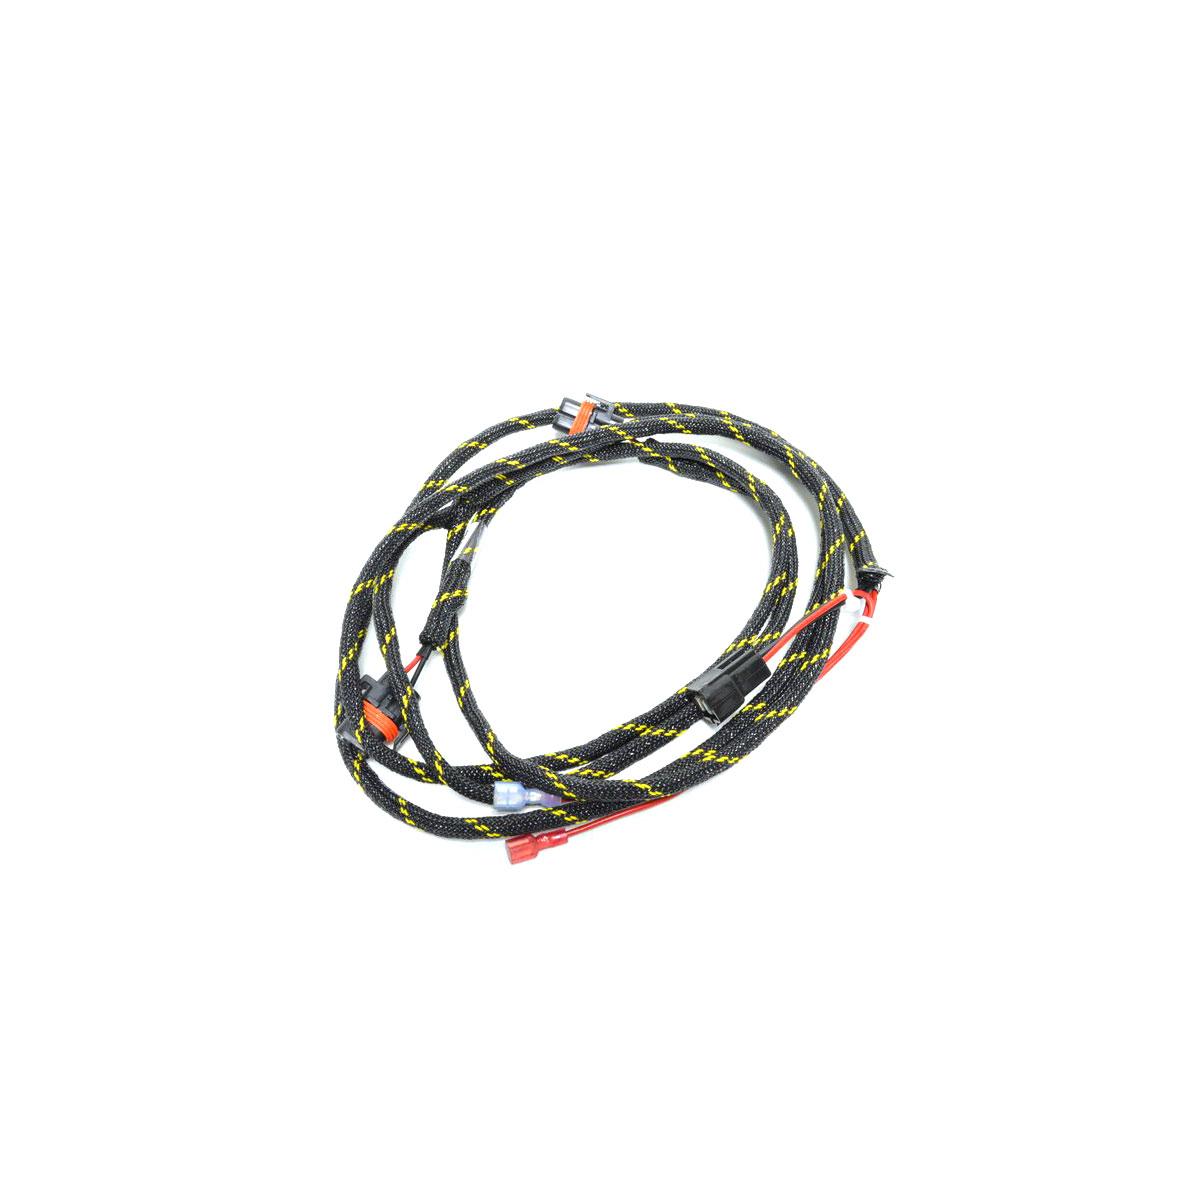 Scag Lights Wire Harness Scz